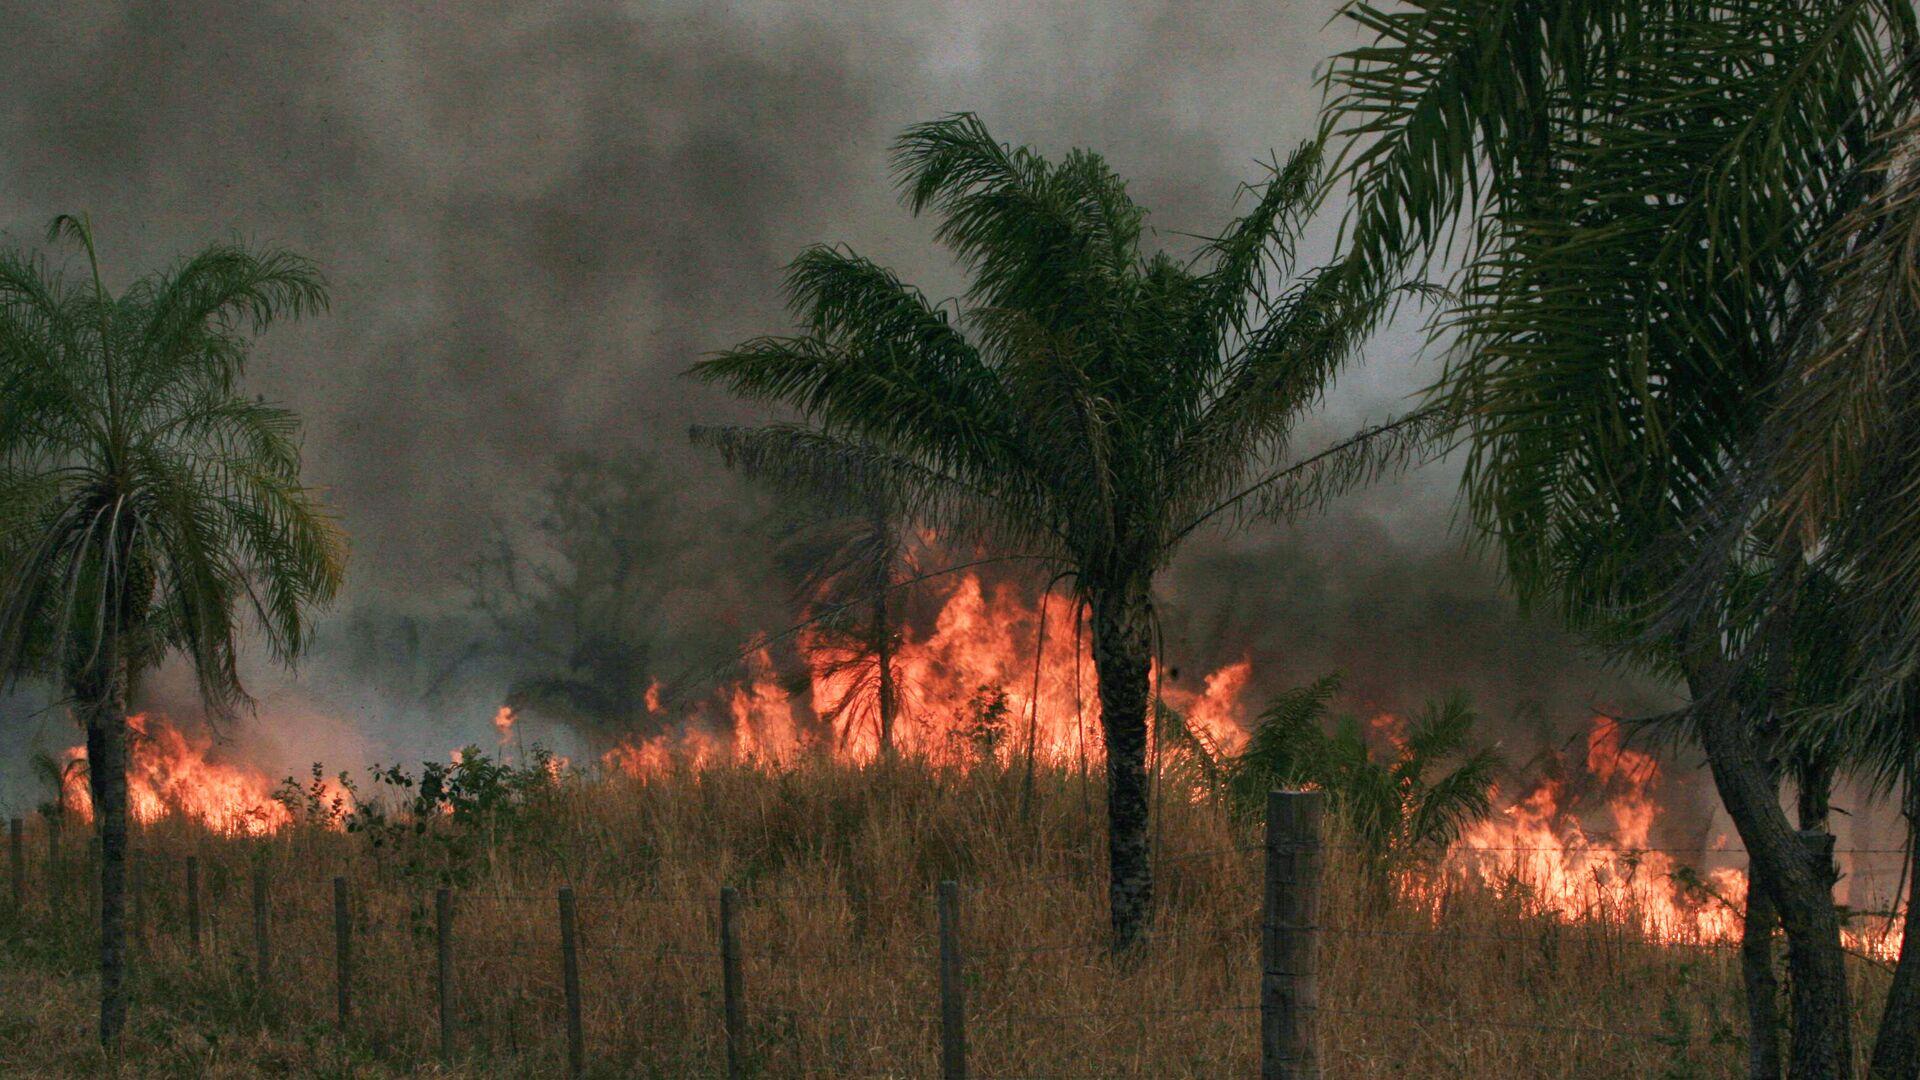 Incendios forestrales en Bolivia - Sputnik Mundo, 1920, 02.08.2021